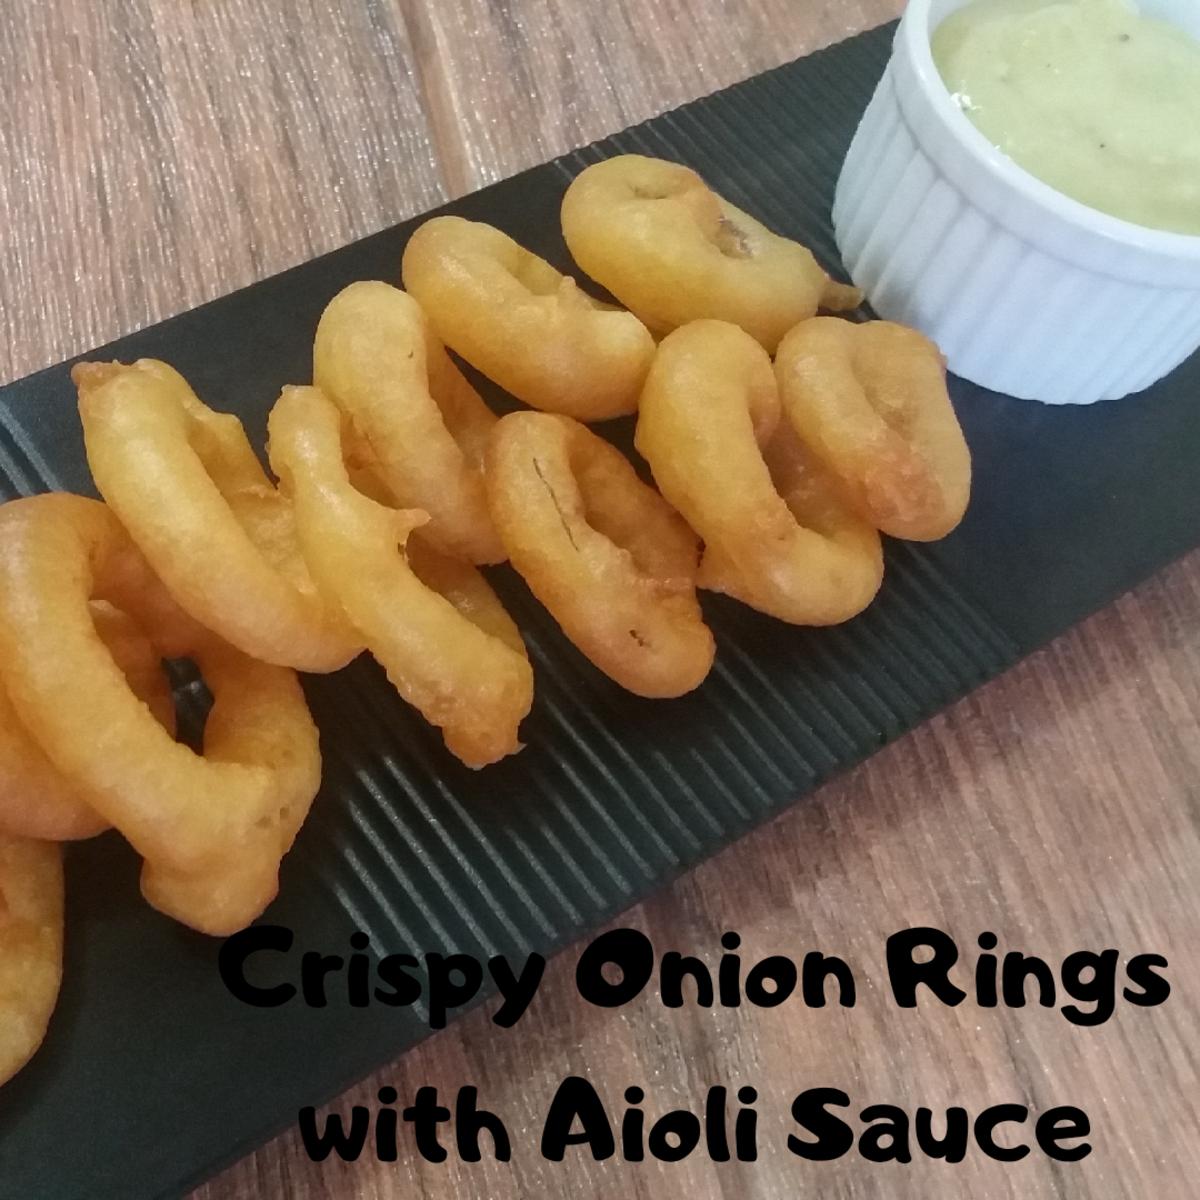 How to Make Crispy Onion Rings With Aioli Sauce